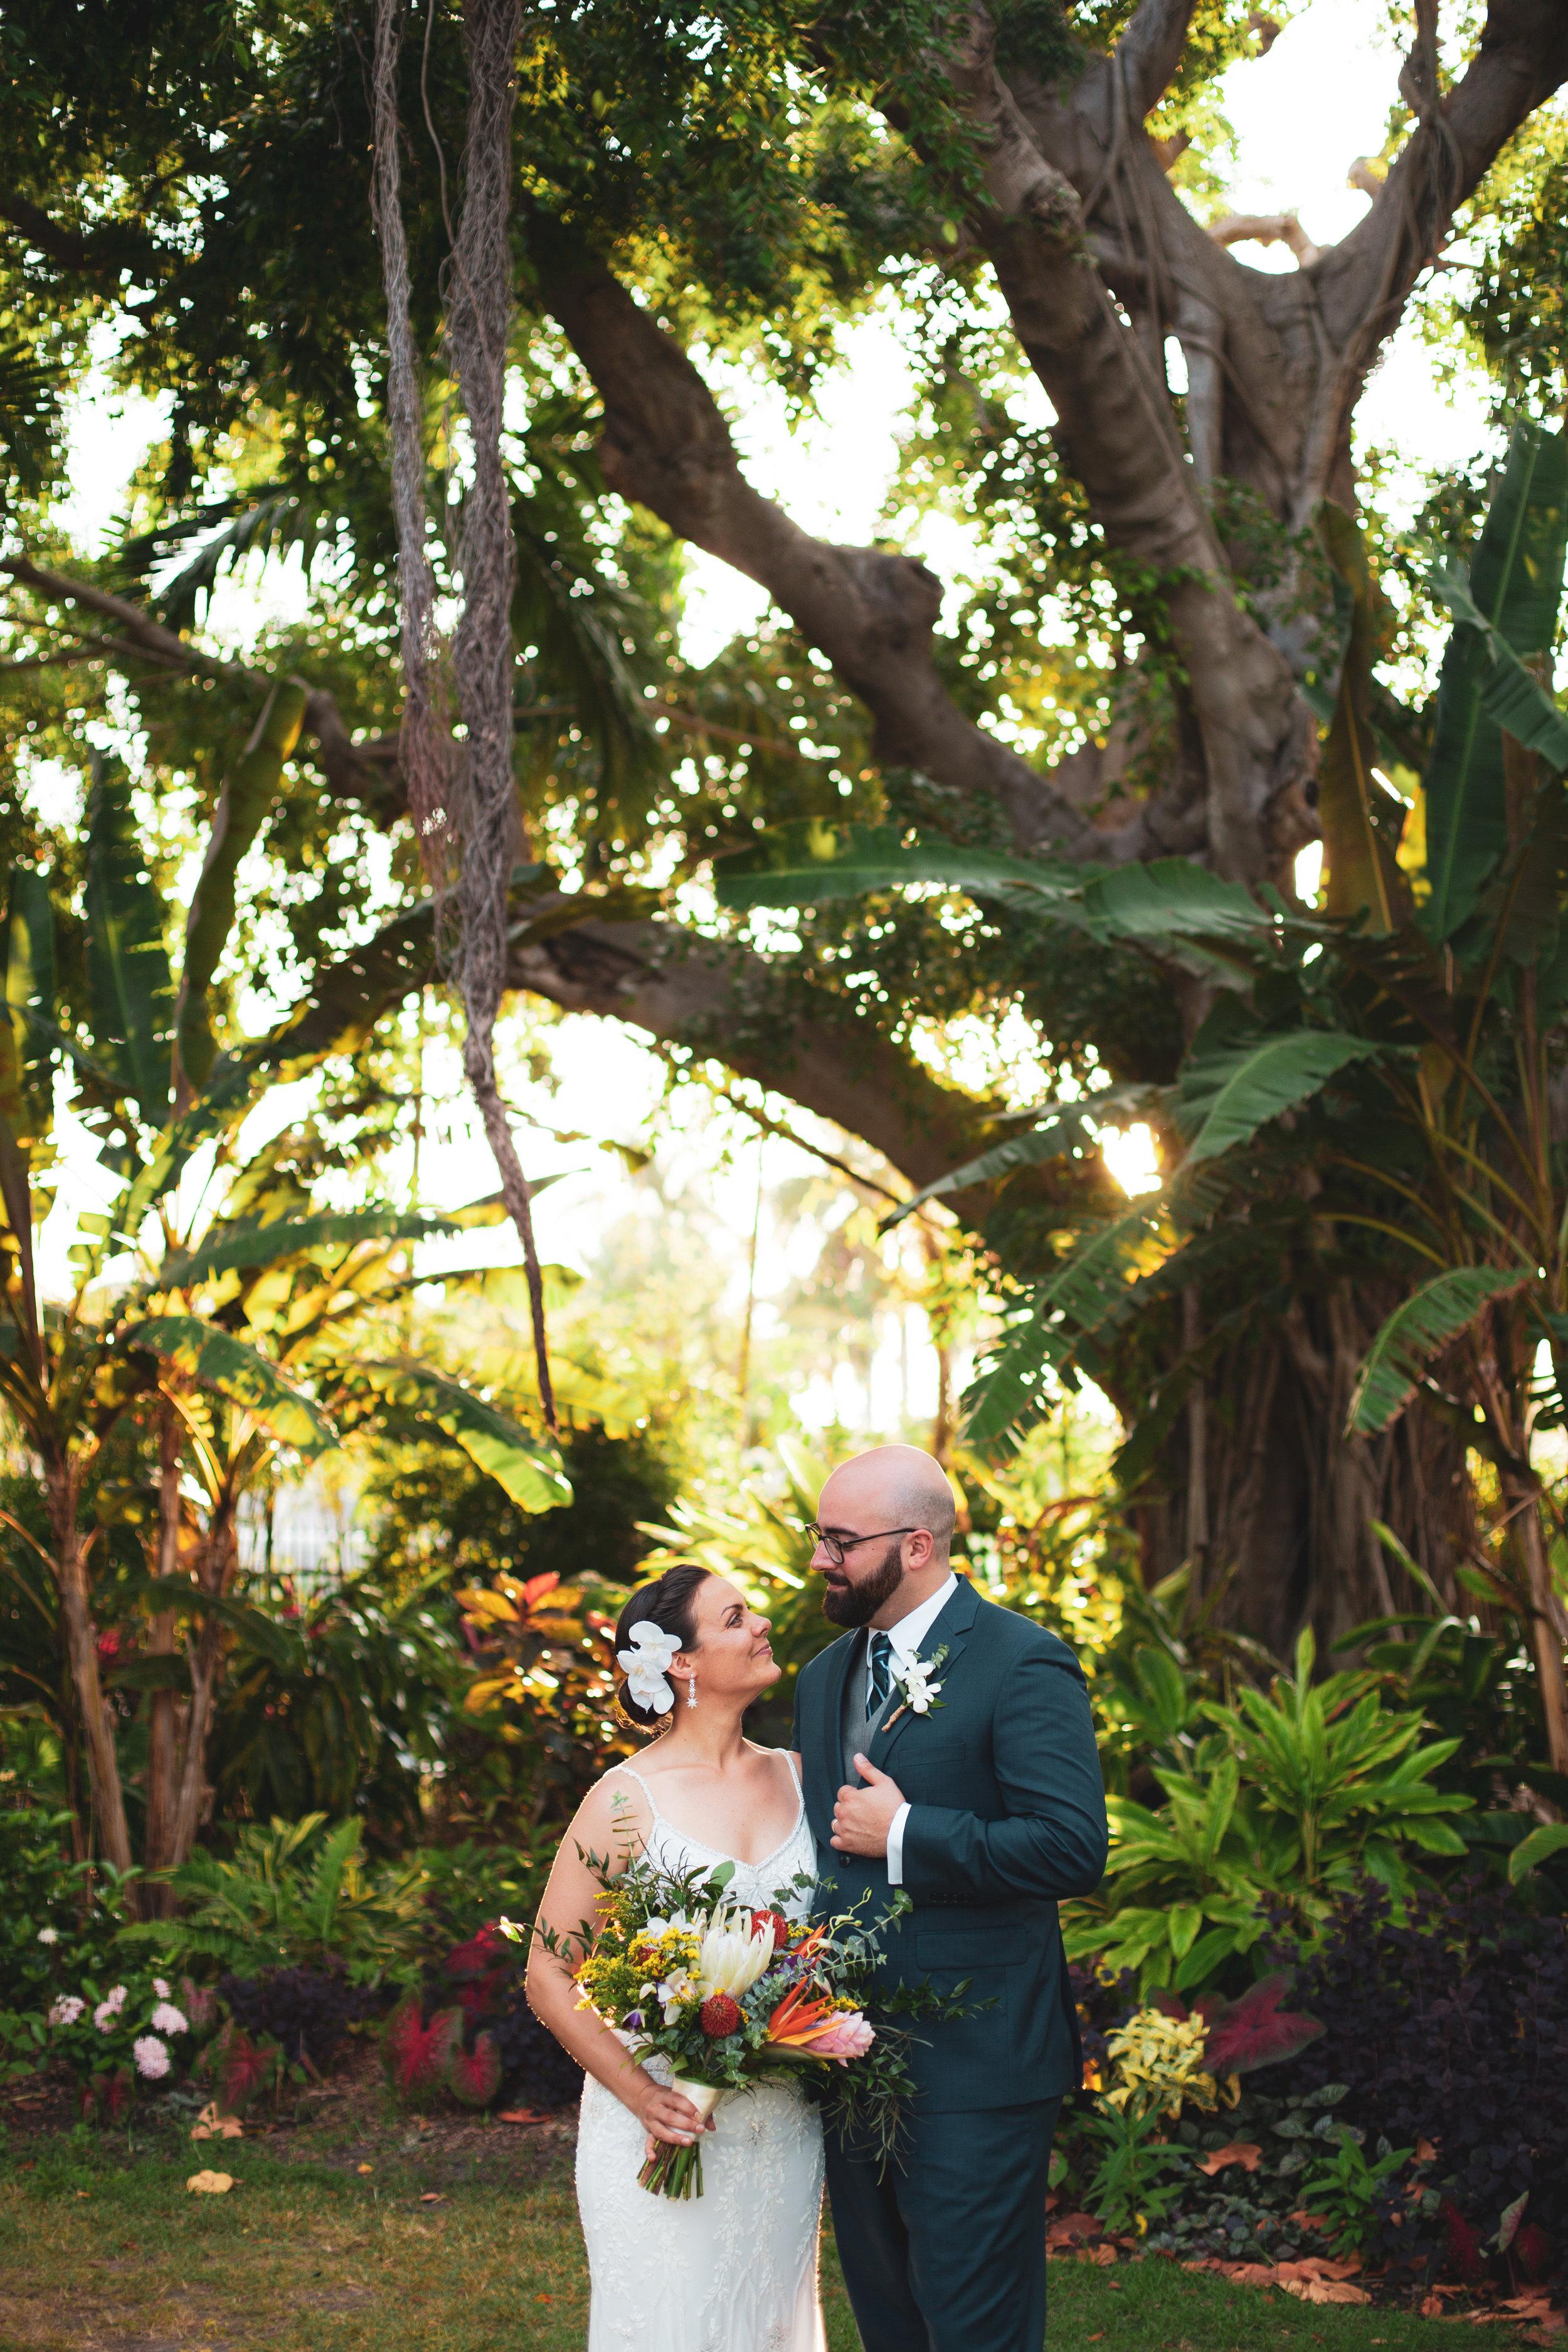 miami beach botanical garden florida wedding © kelilina photography 20190601132500-5.jpg